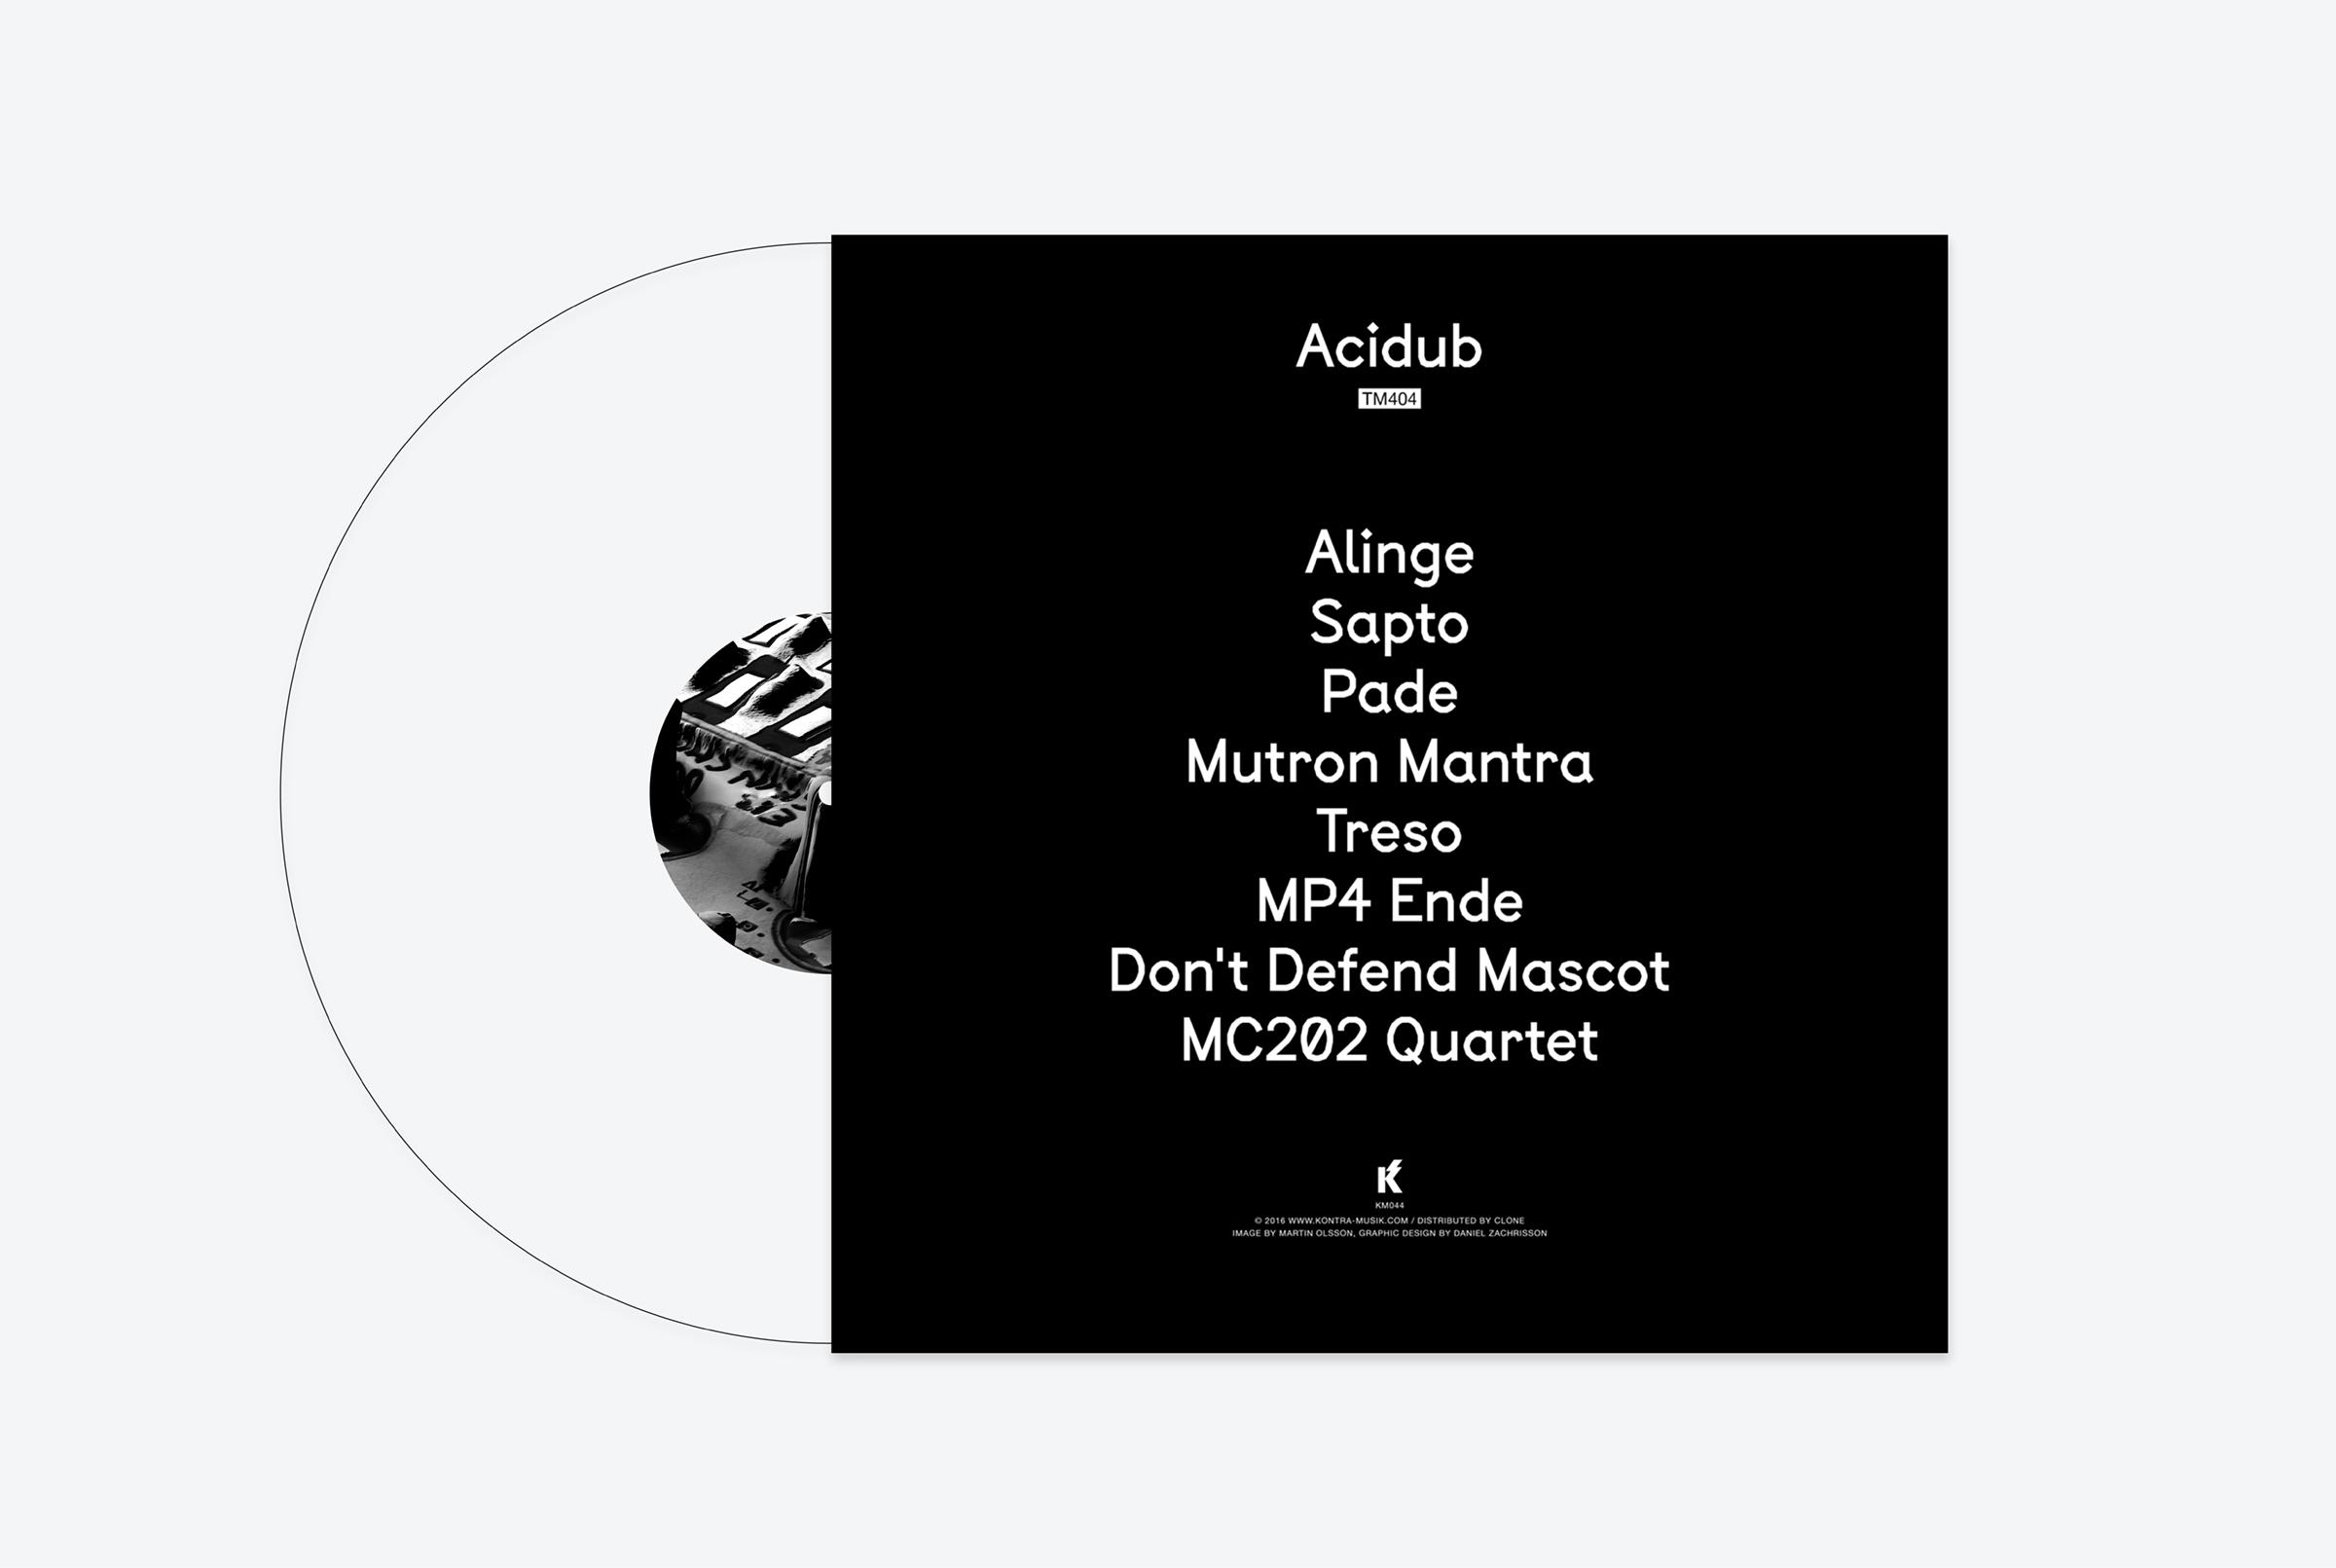 tm404_acidub_kontra-musik_danielzachrisson_B.jpg